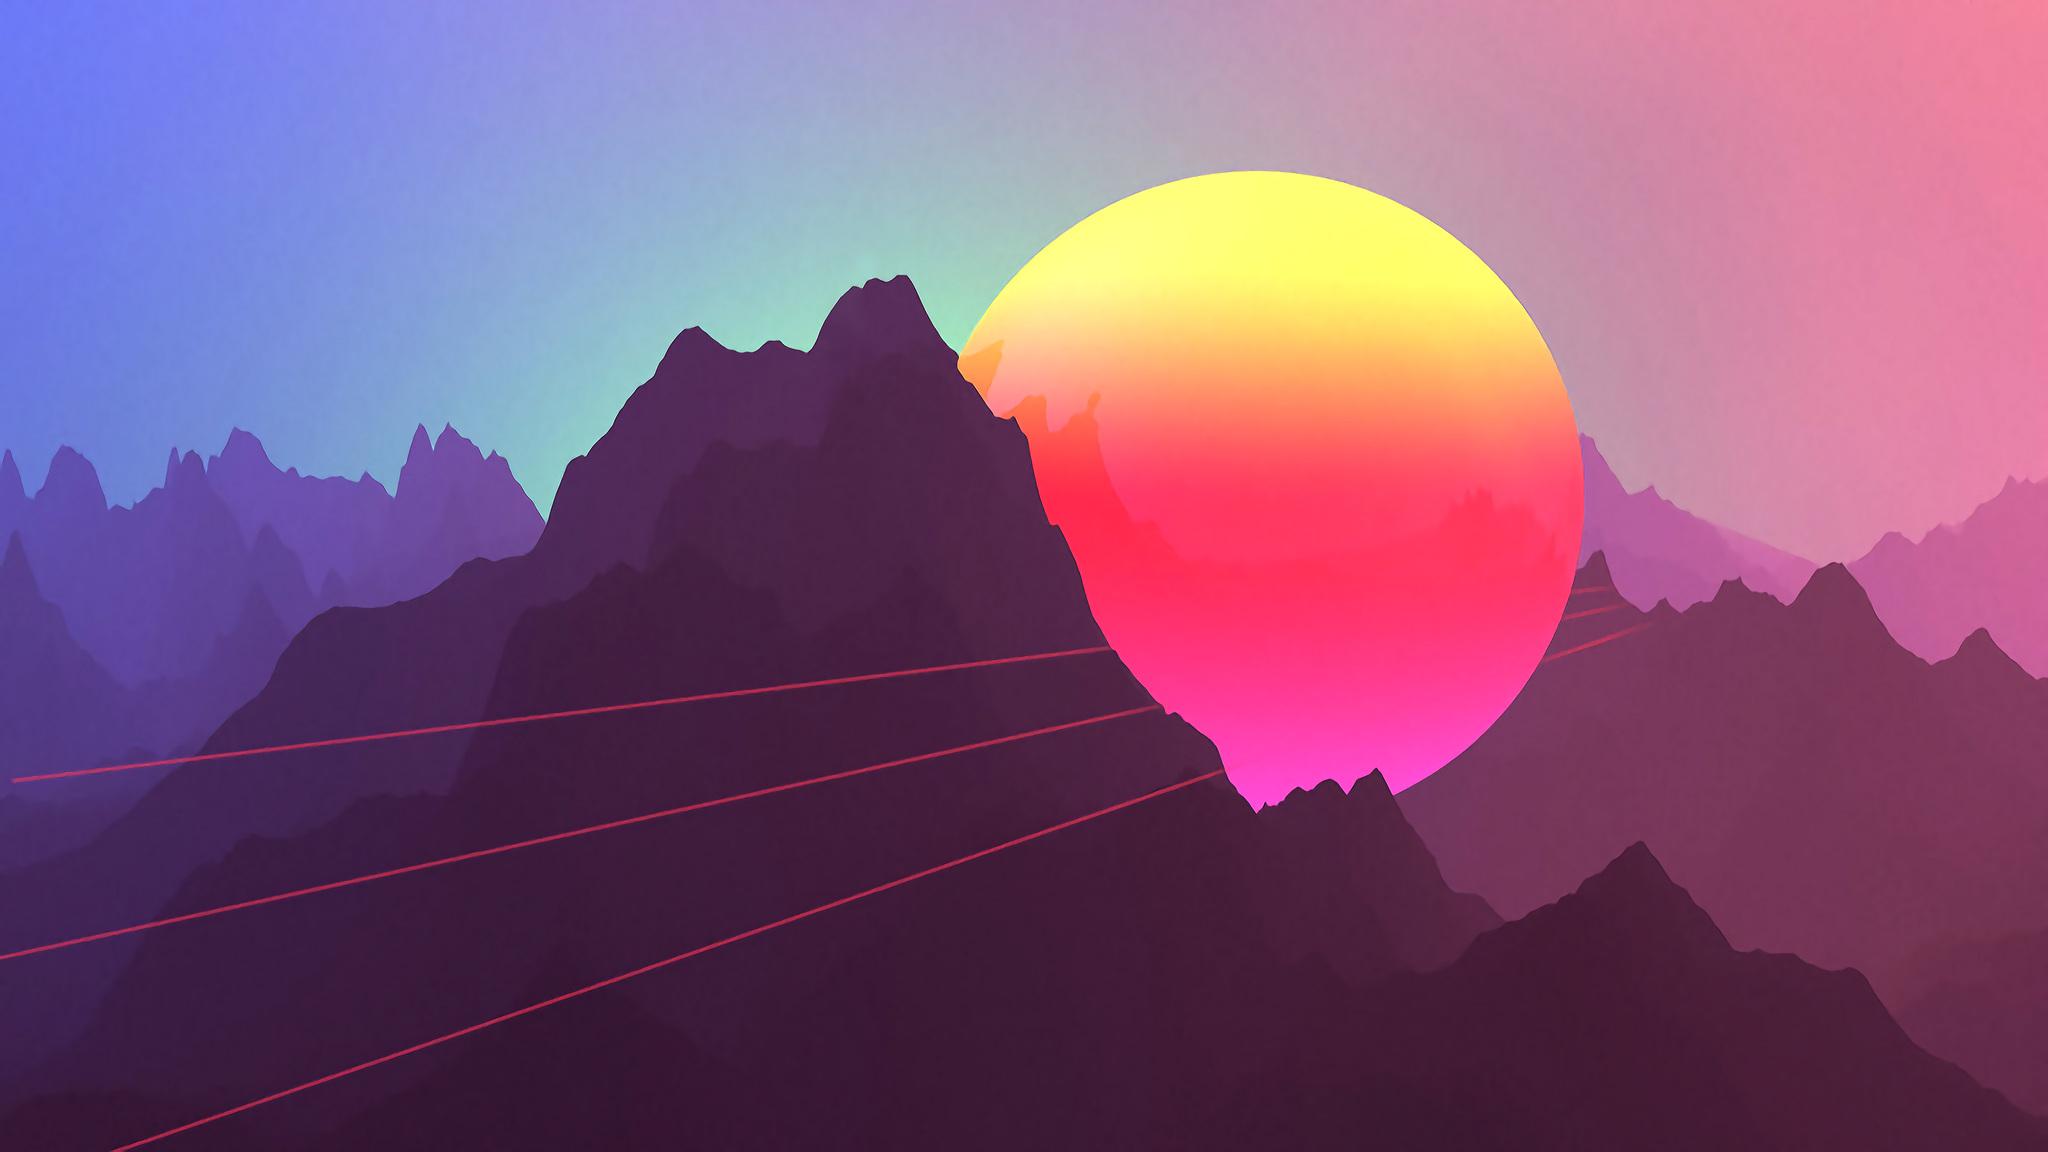 retrowave-3-dimensional-artwork-neon-oceanchrome-eb.jpg